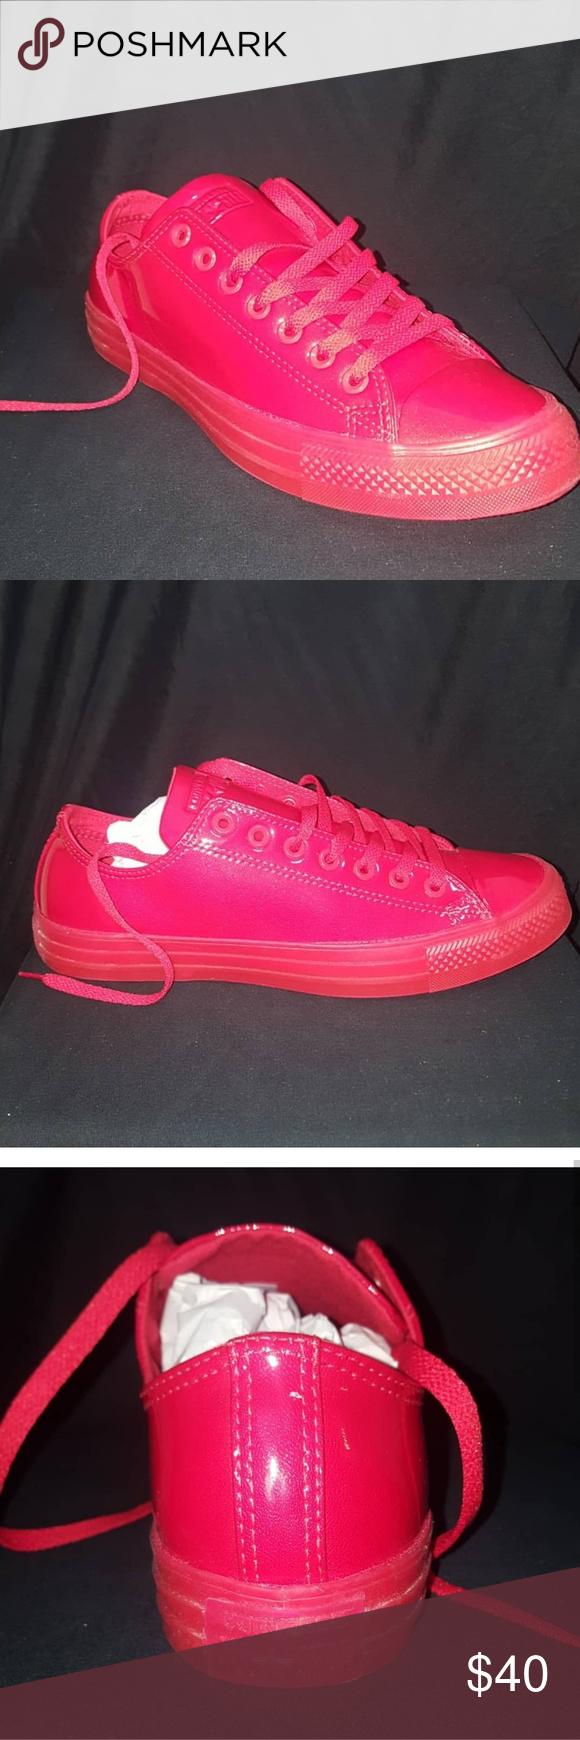 1f12fdb23d30 CONVERSE CHUCK TAYLOR RED PATENT LEATHER UNISEX BNWB EXCELLENT CONDITION  LADIES 11 MEN 9 Converse Shoes Athletic Shoes